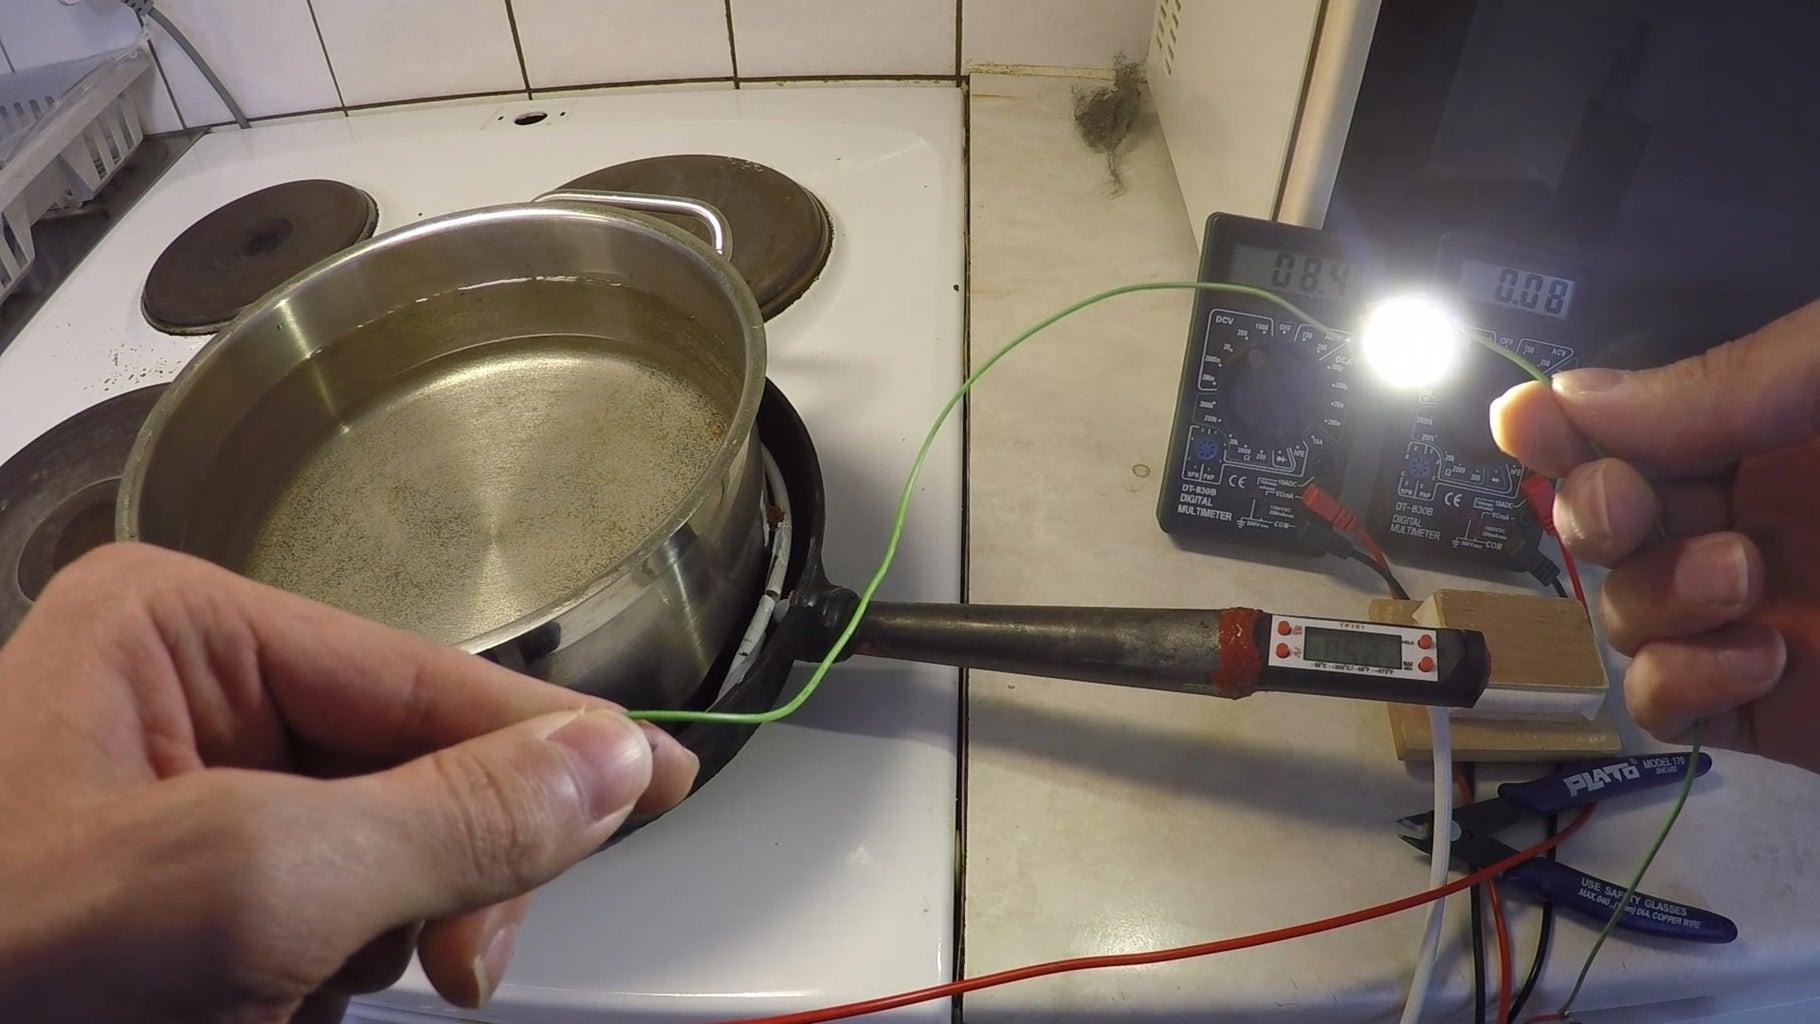 DIY Pot Generator, 9 TEG Modules Test With 10W LED Chip